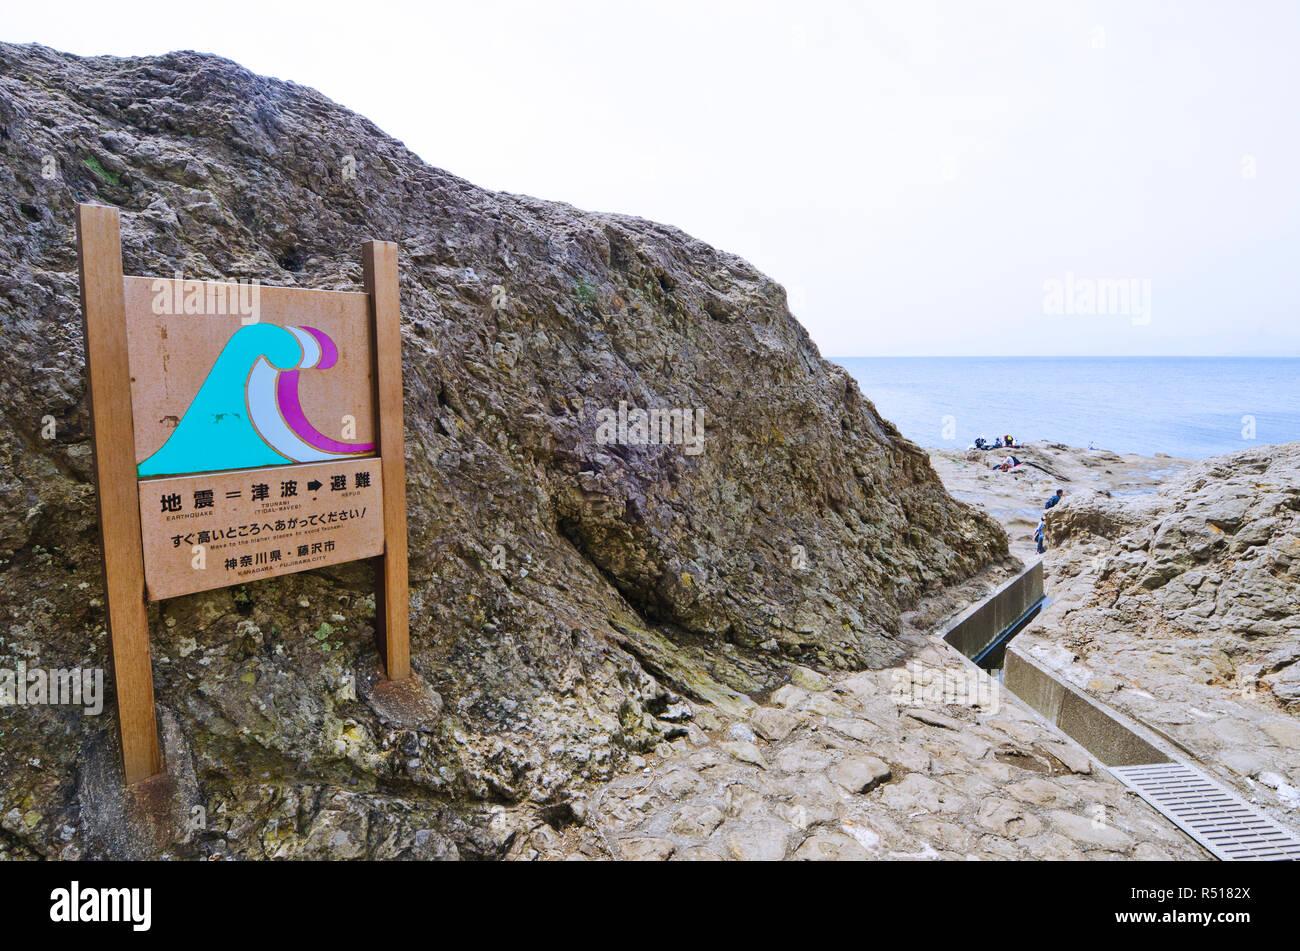 Tsunami Evacuation Route Sign on Enoshima island, Kanagawa Prefecture, Japan - Stock Image